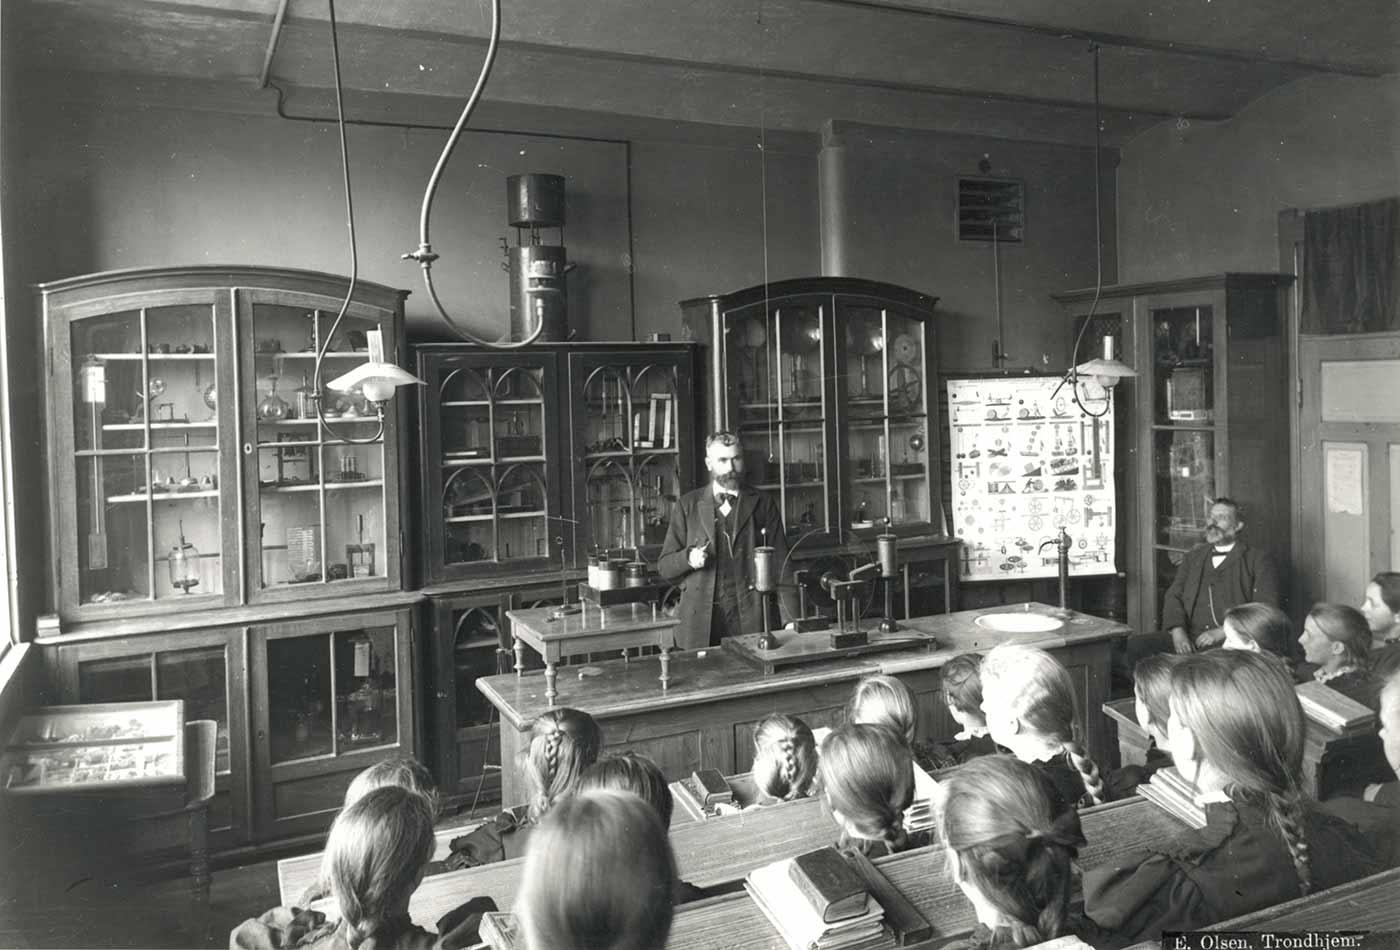 Science class at Kalvskindet school (ca. 1900).